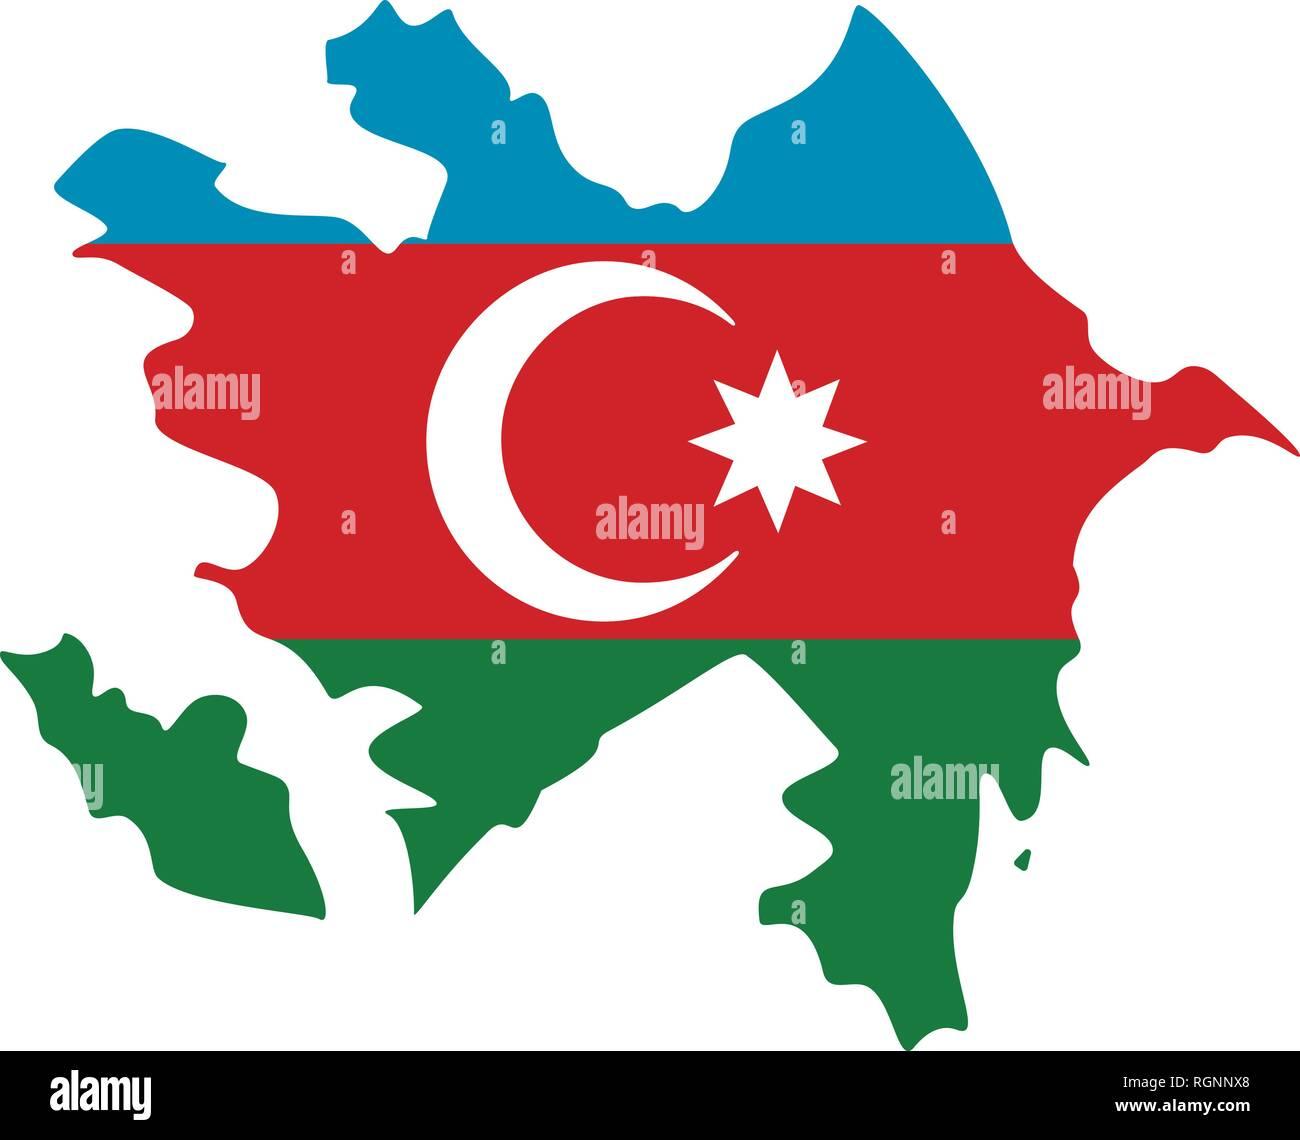 Map Of Azerbaijan With Flag Inside Azerbaijan Map Vector Illustration Stock Vector Image Art Alamy